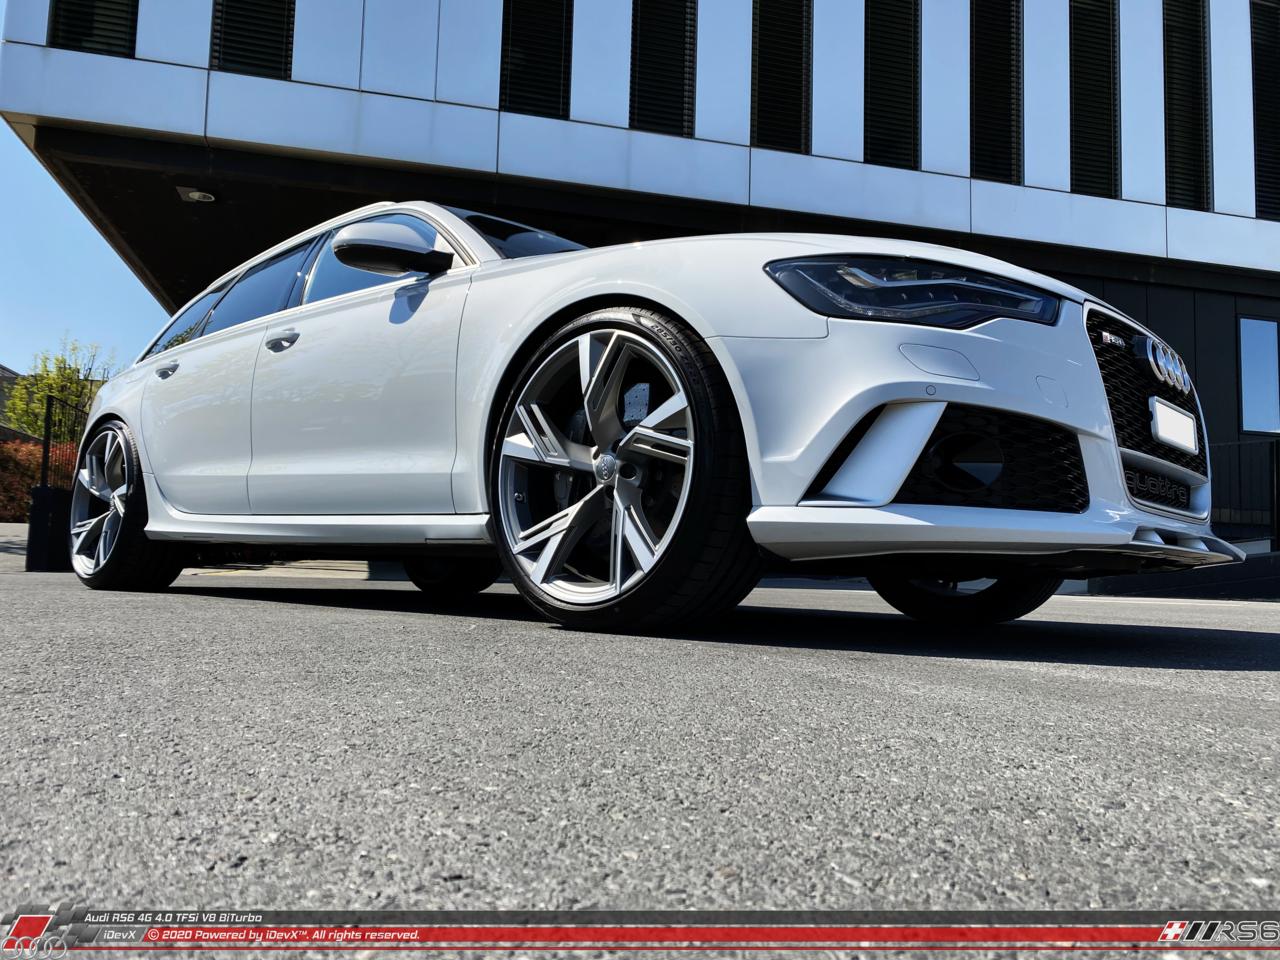 24.04.2020_Audi-RS6_iDevX_007.png